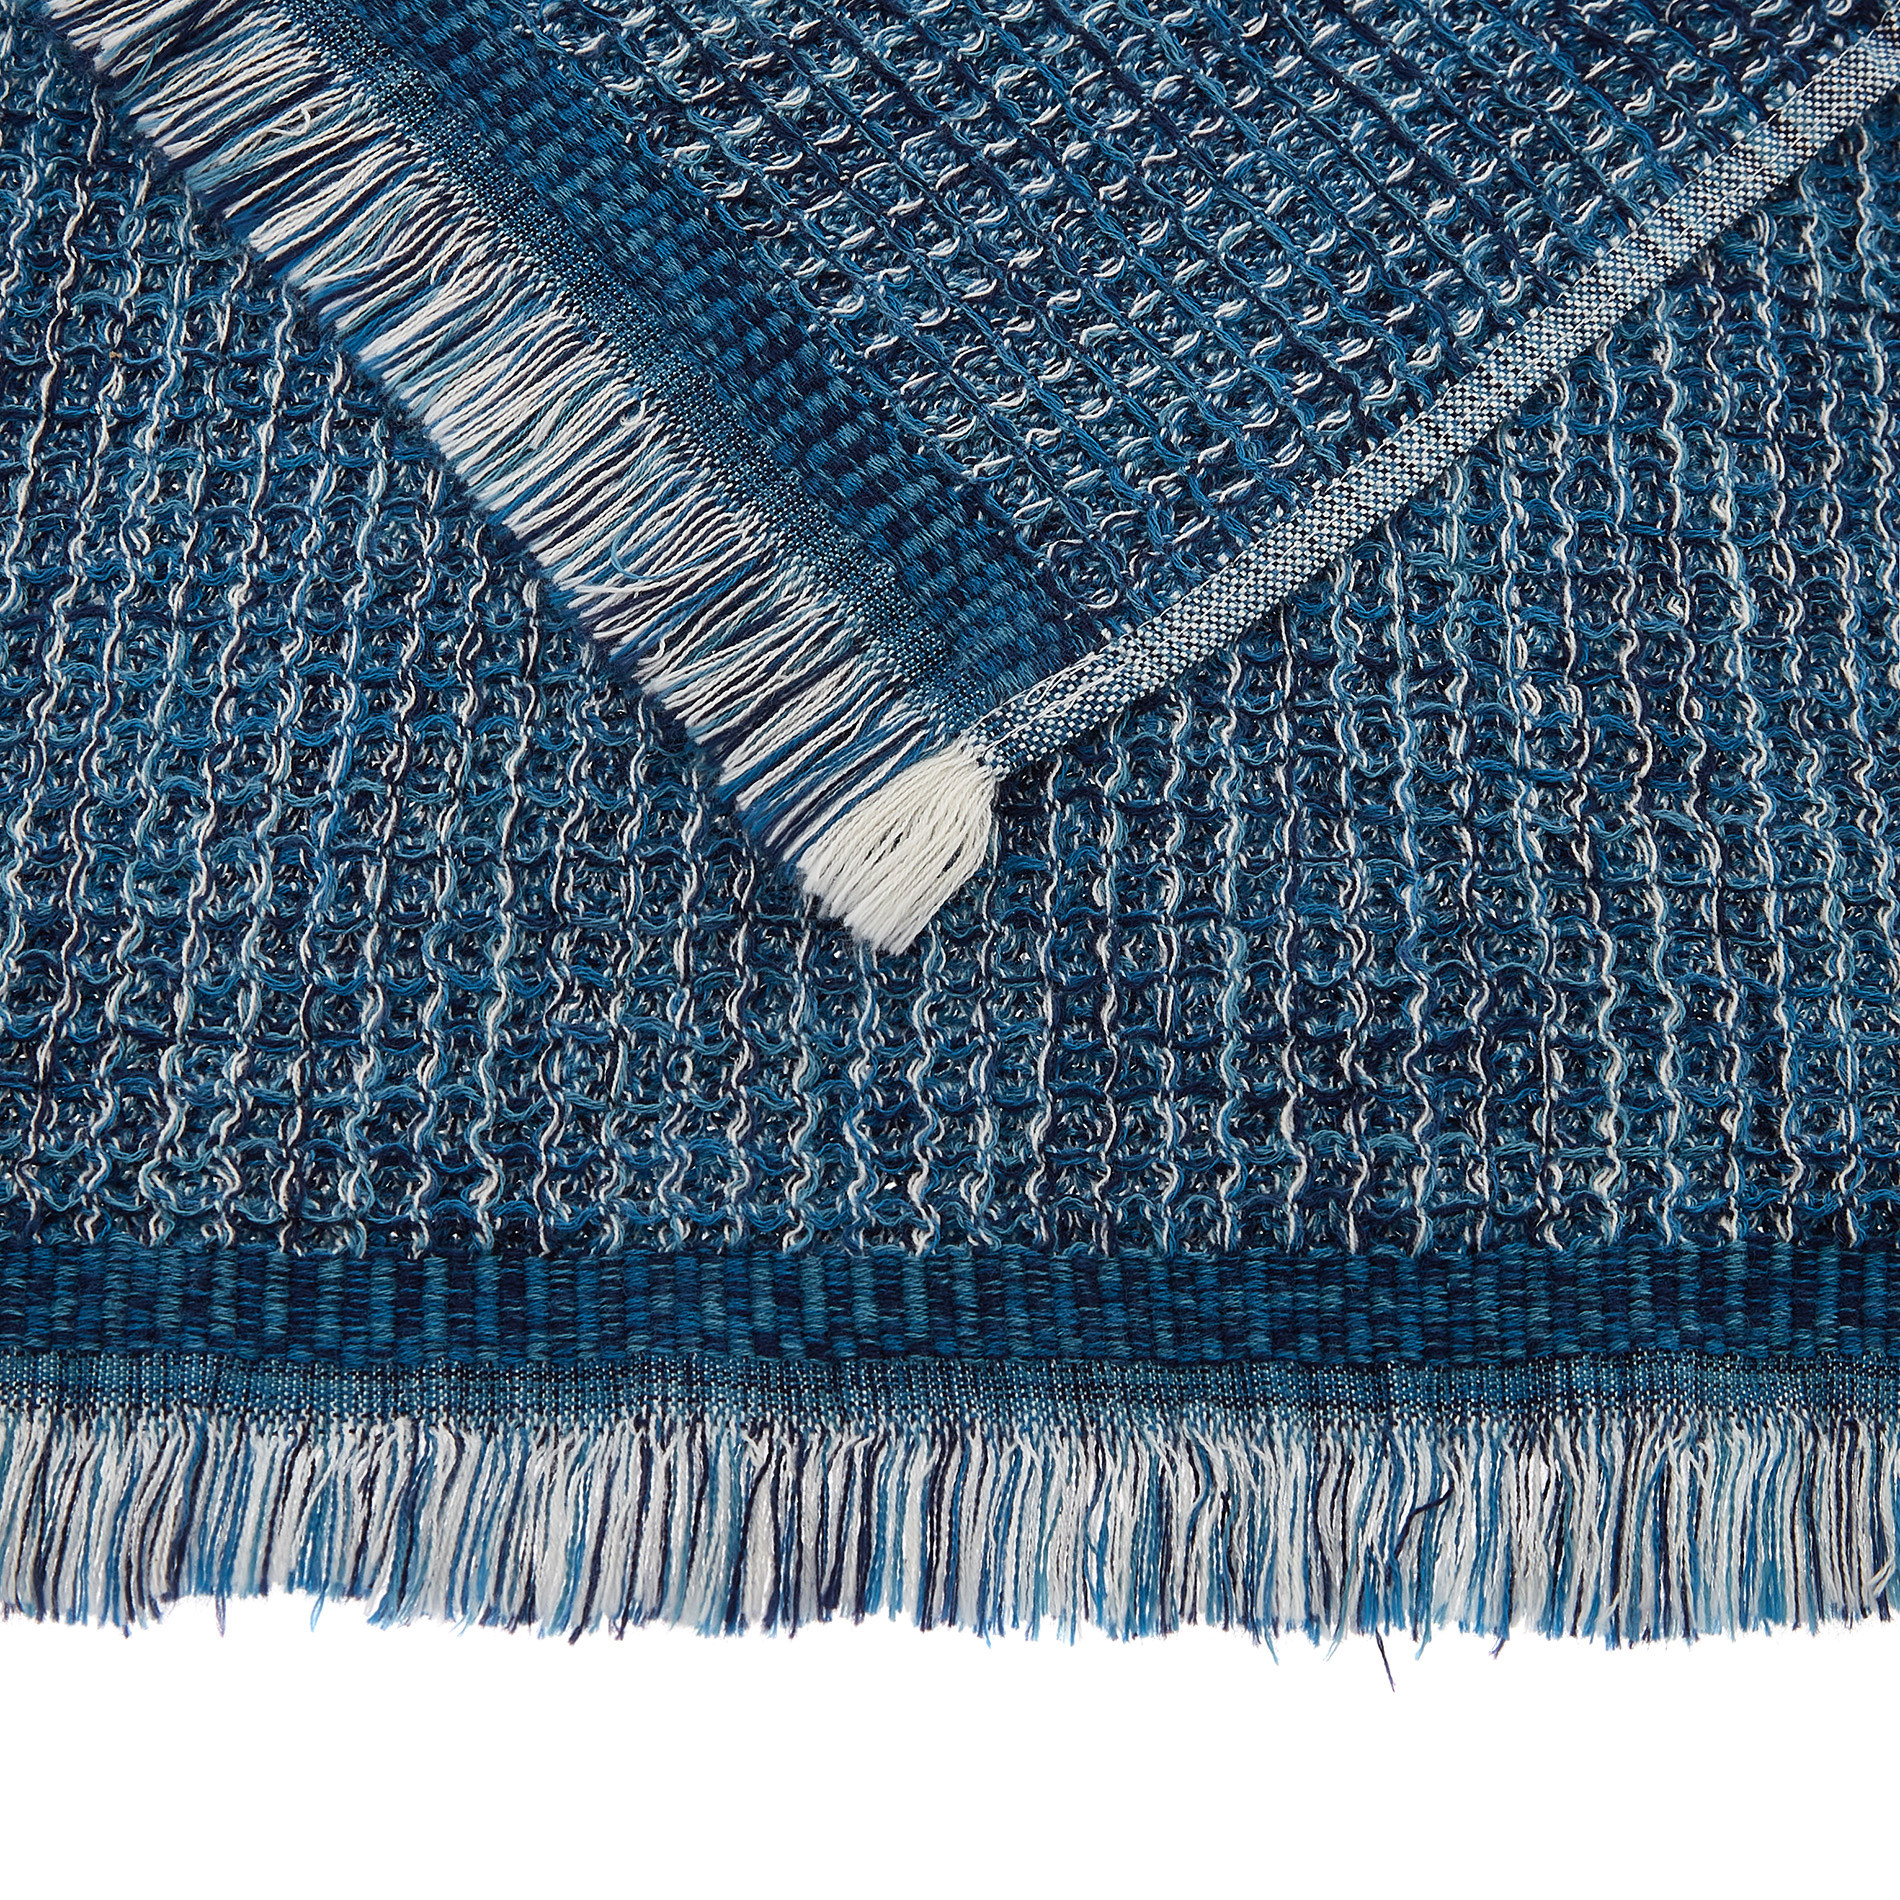 Asciugamano cotone nido d'ape effetto melange, Blu, large image number 2